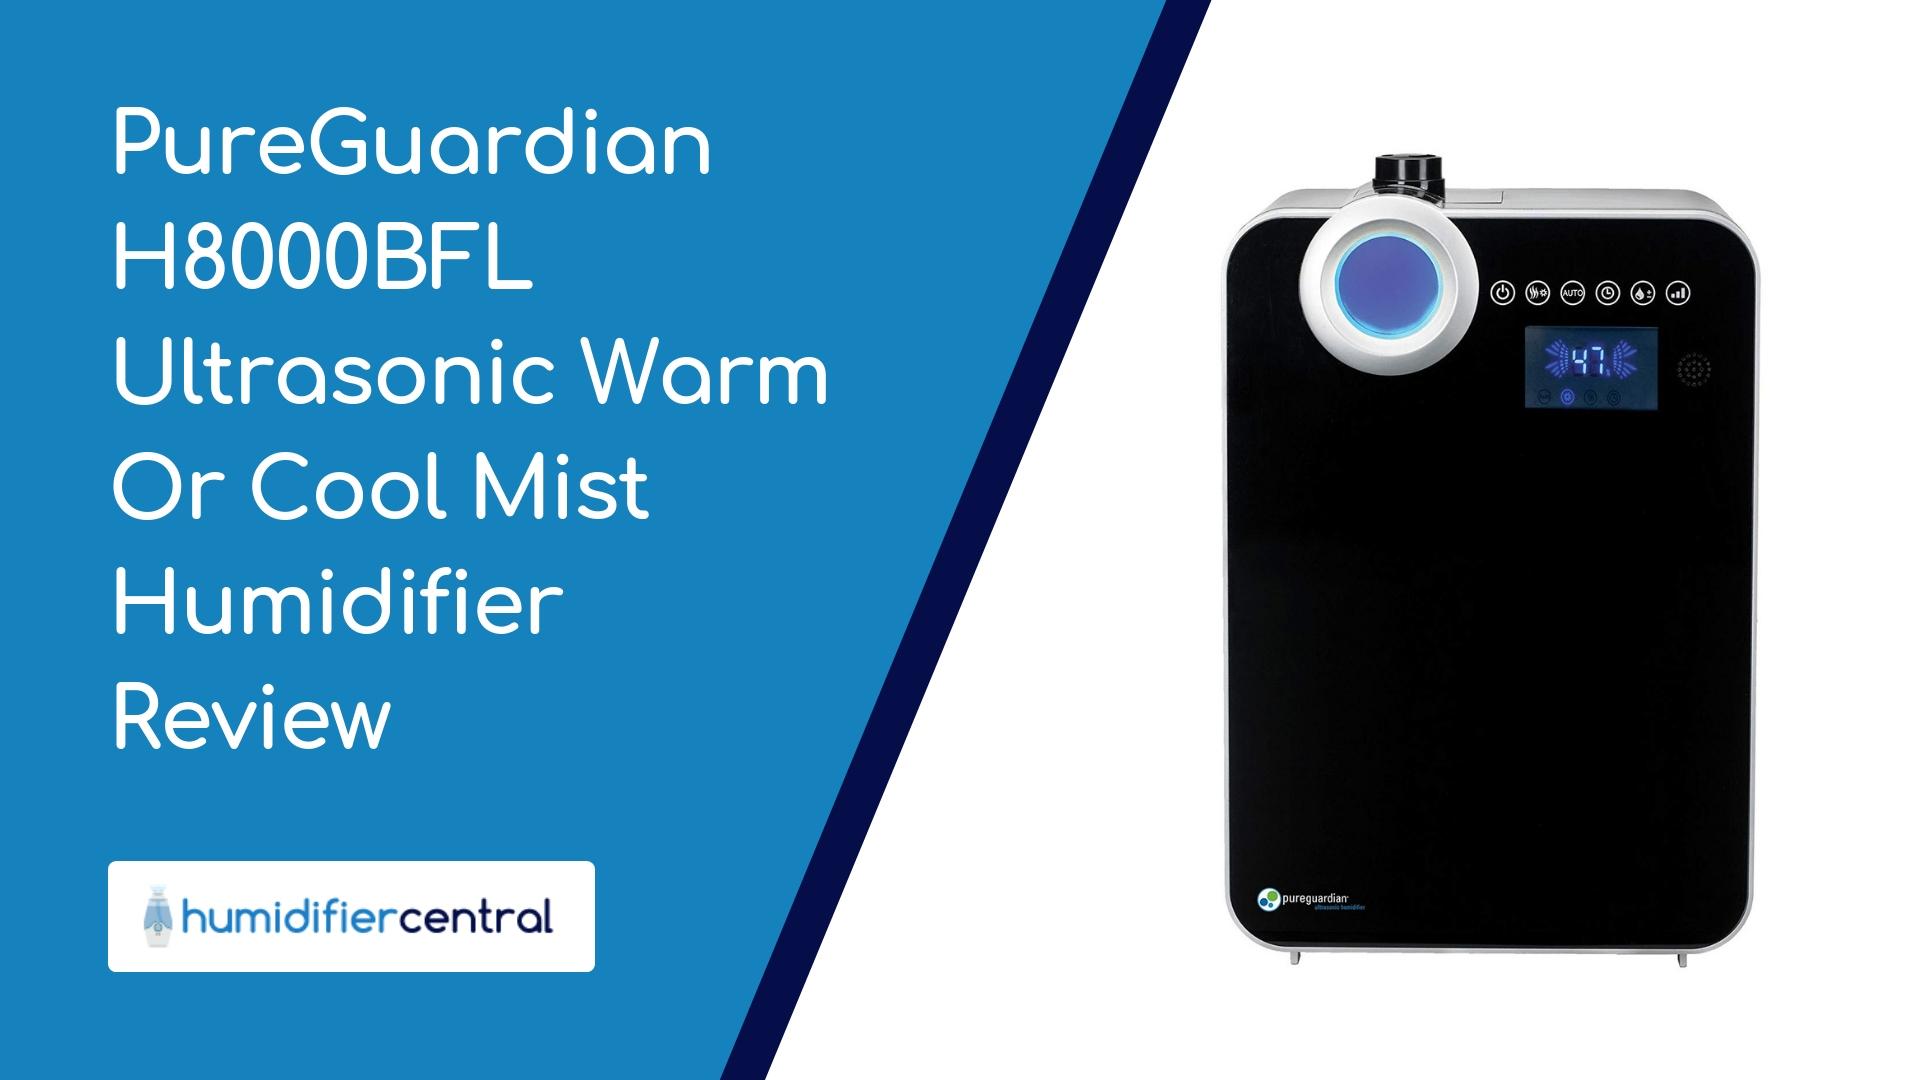 2 Gallons PureGuardian 120-Hour Elite Ultrasonic Warm and Cool Mist Humidifier with Digital Smart Mist Sensor